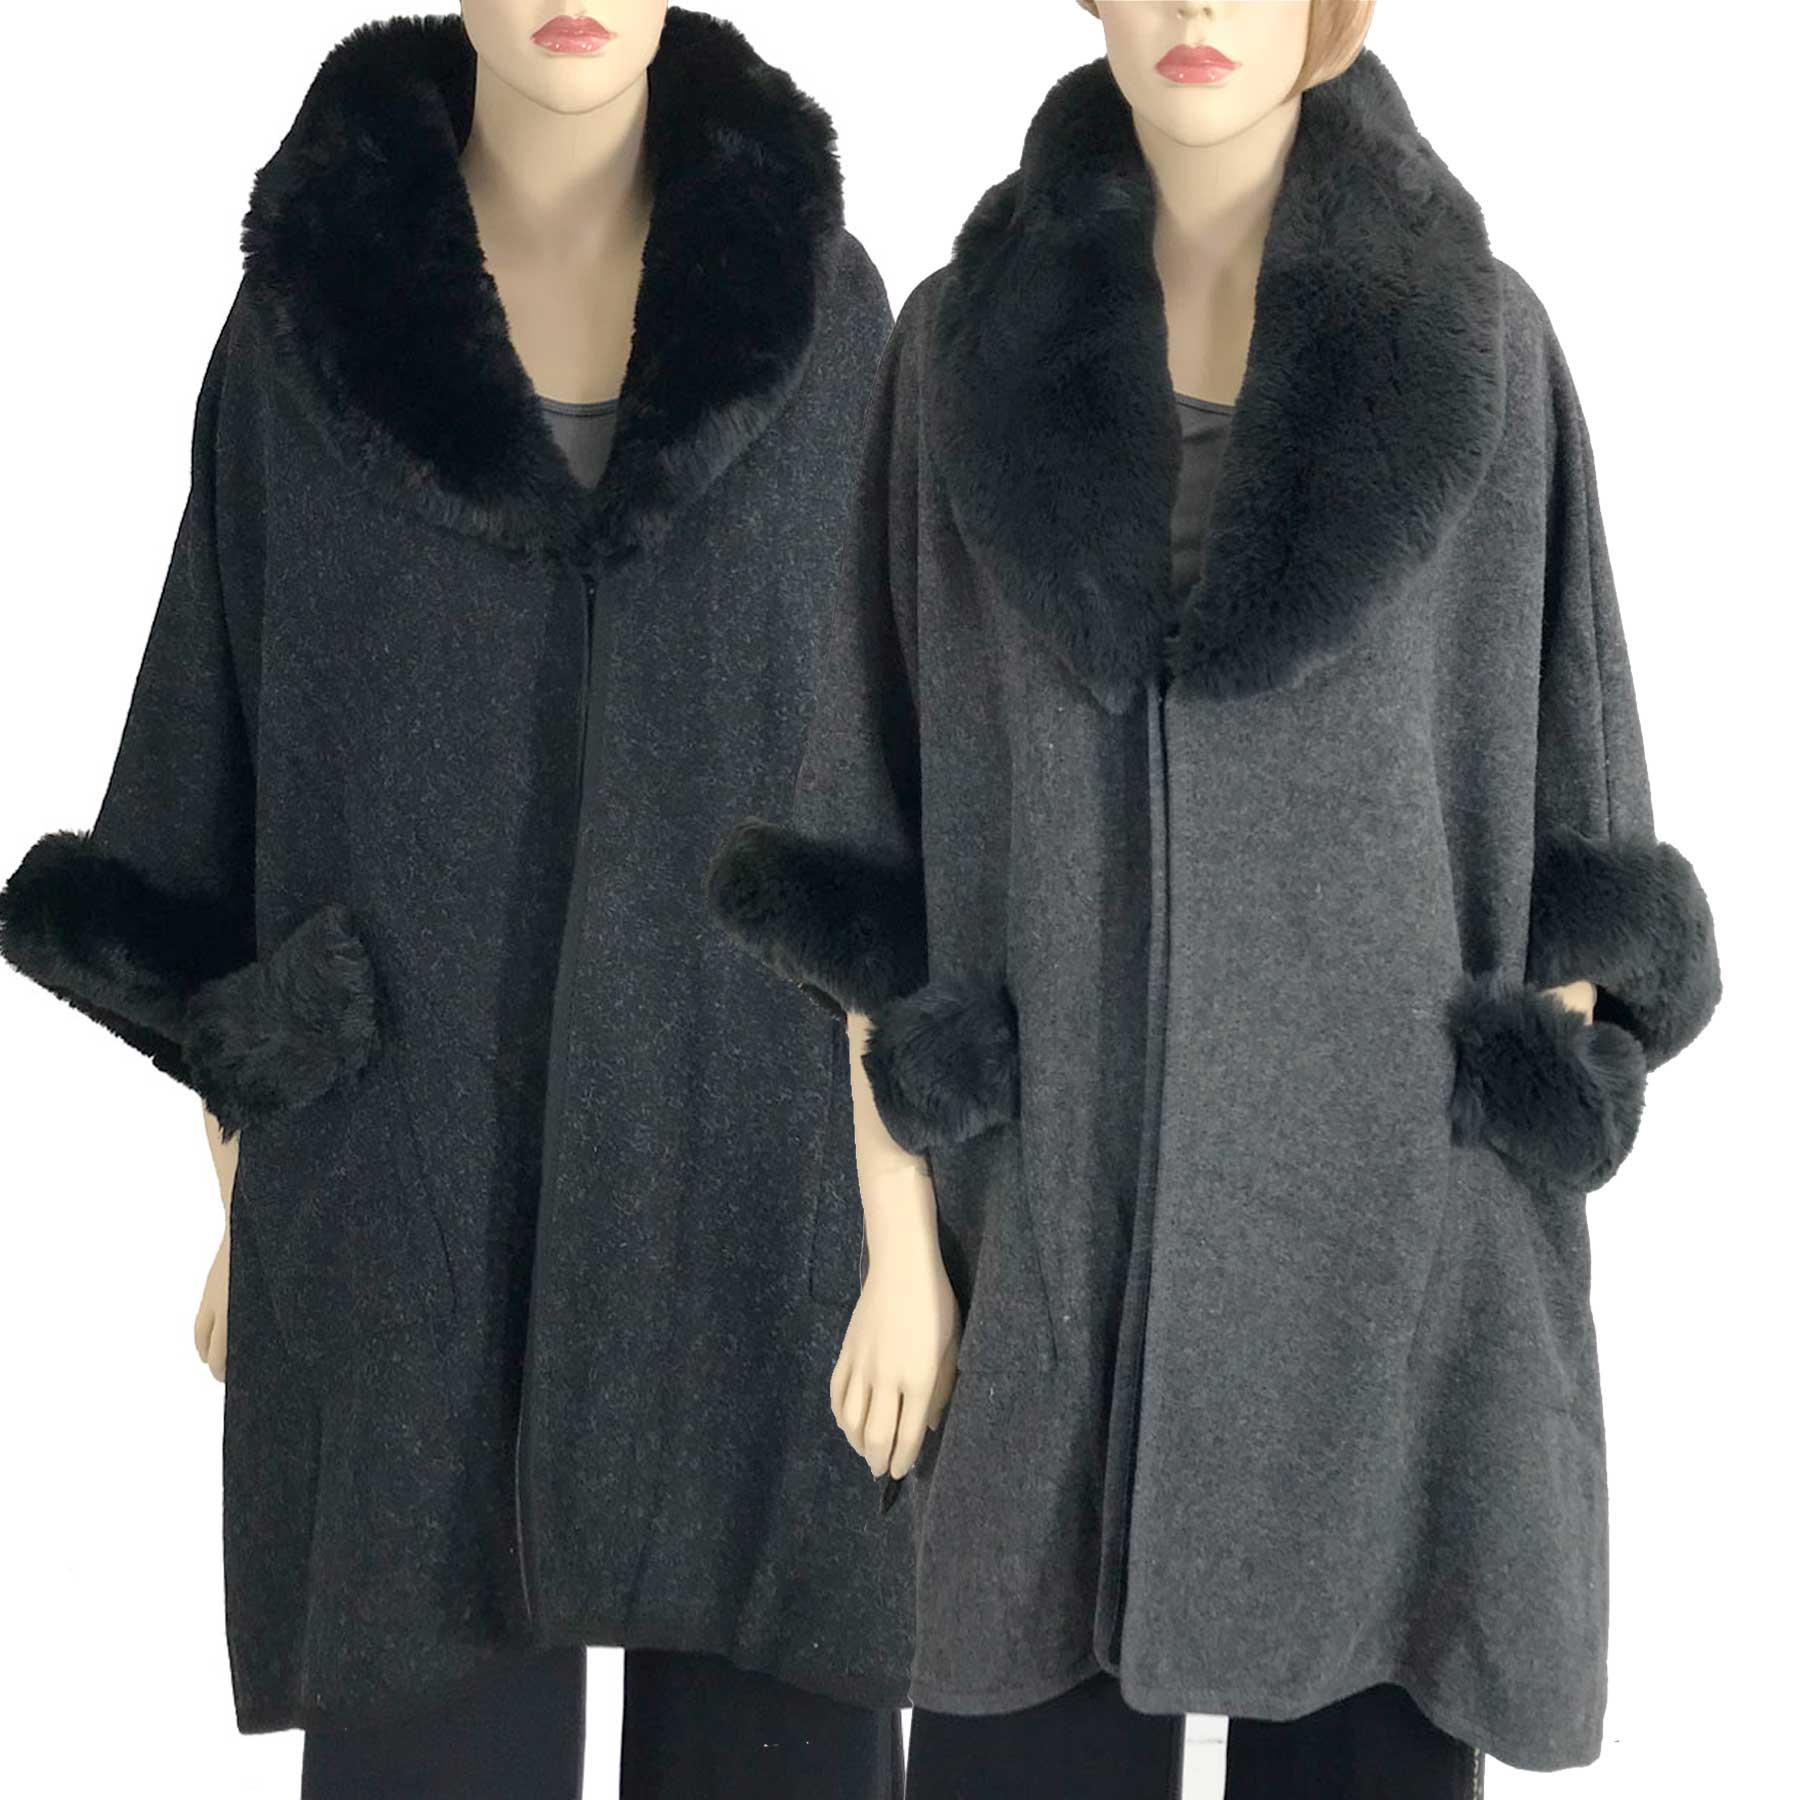 Cloaks - Faux Rabbit Fur Trim w/ Pockets LC13